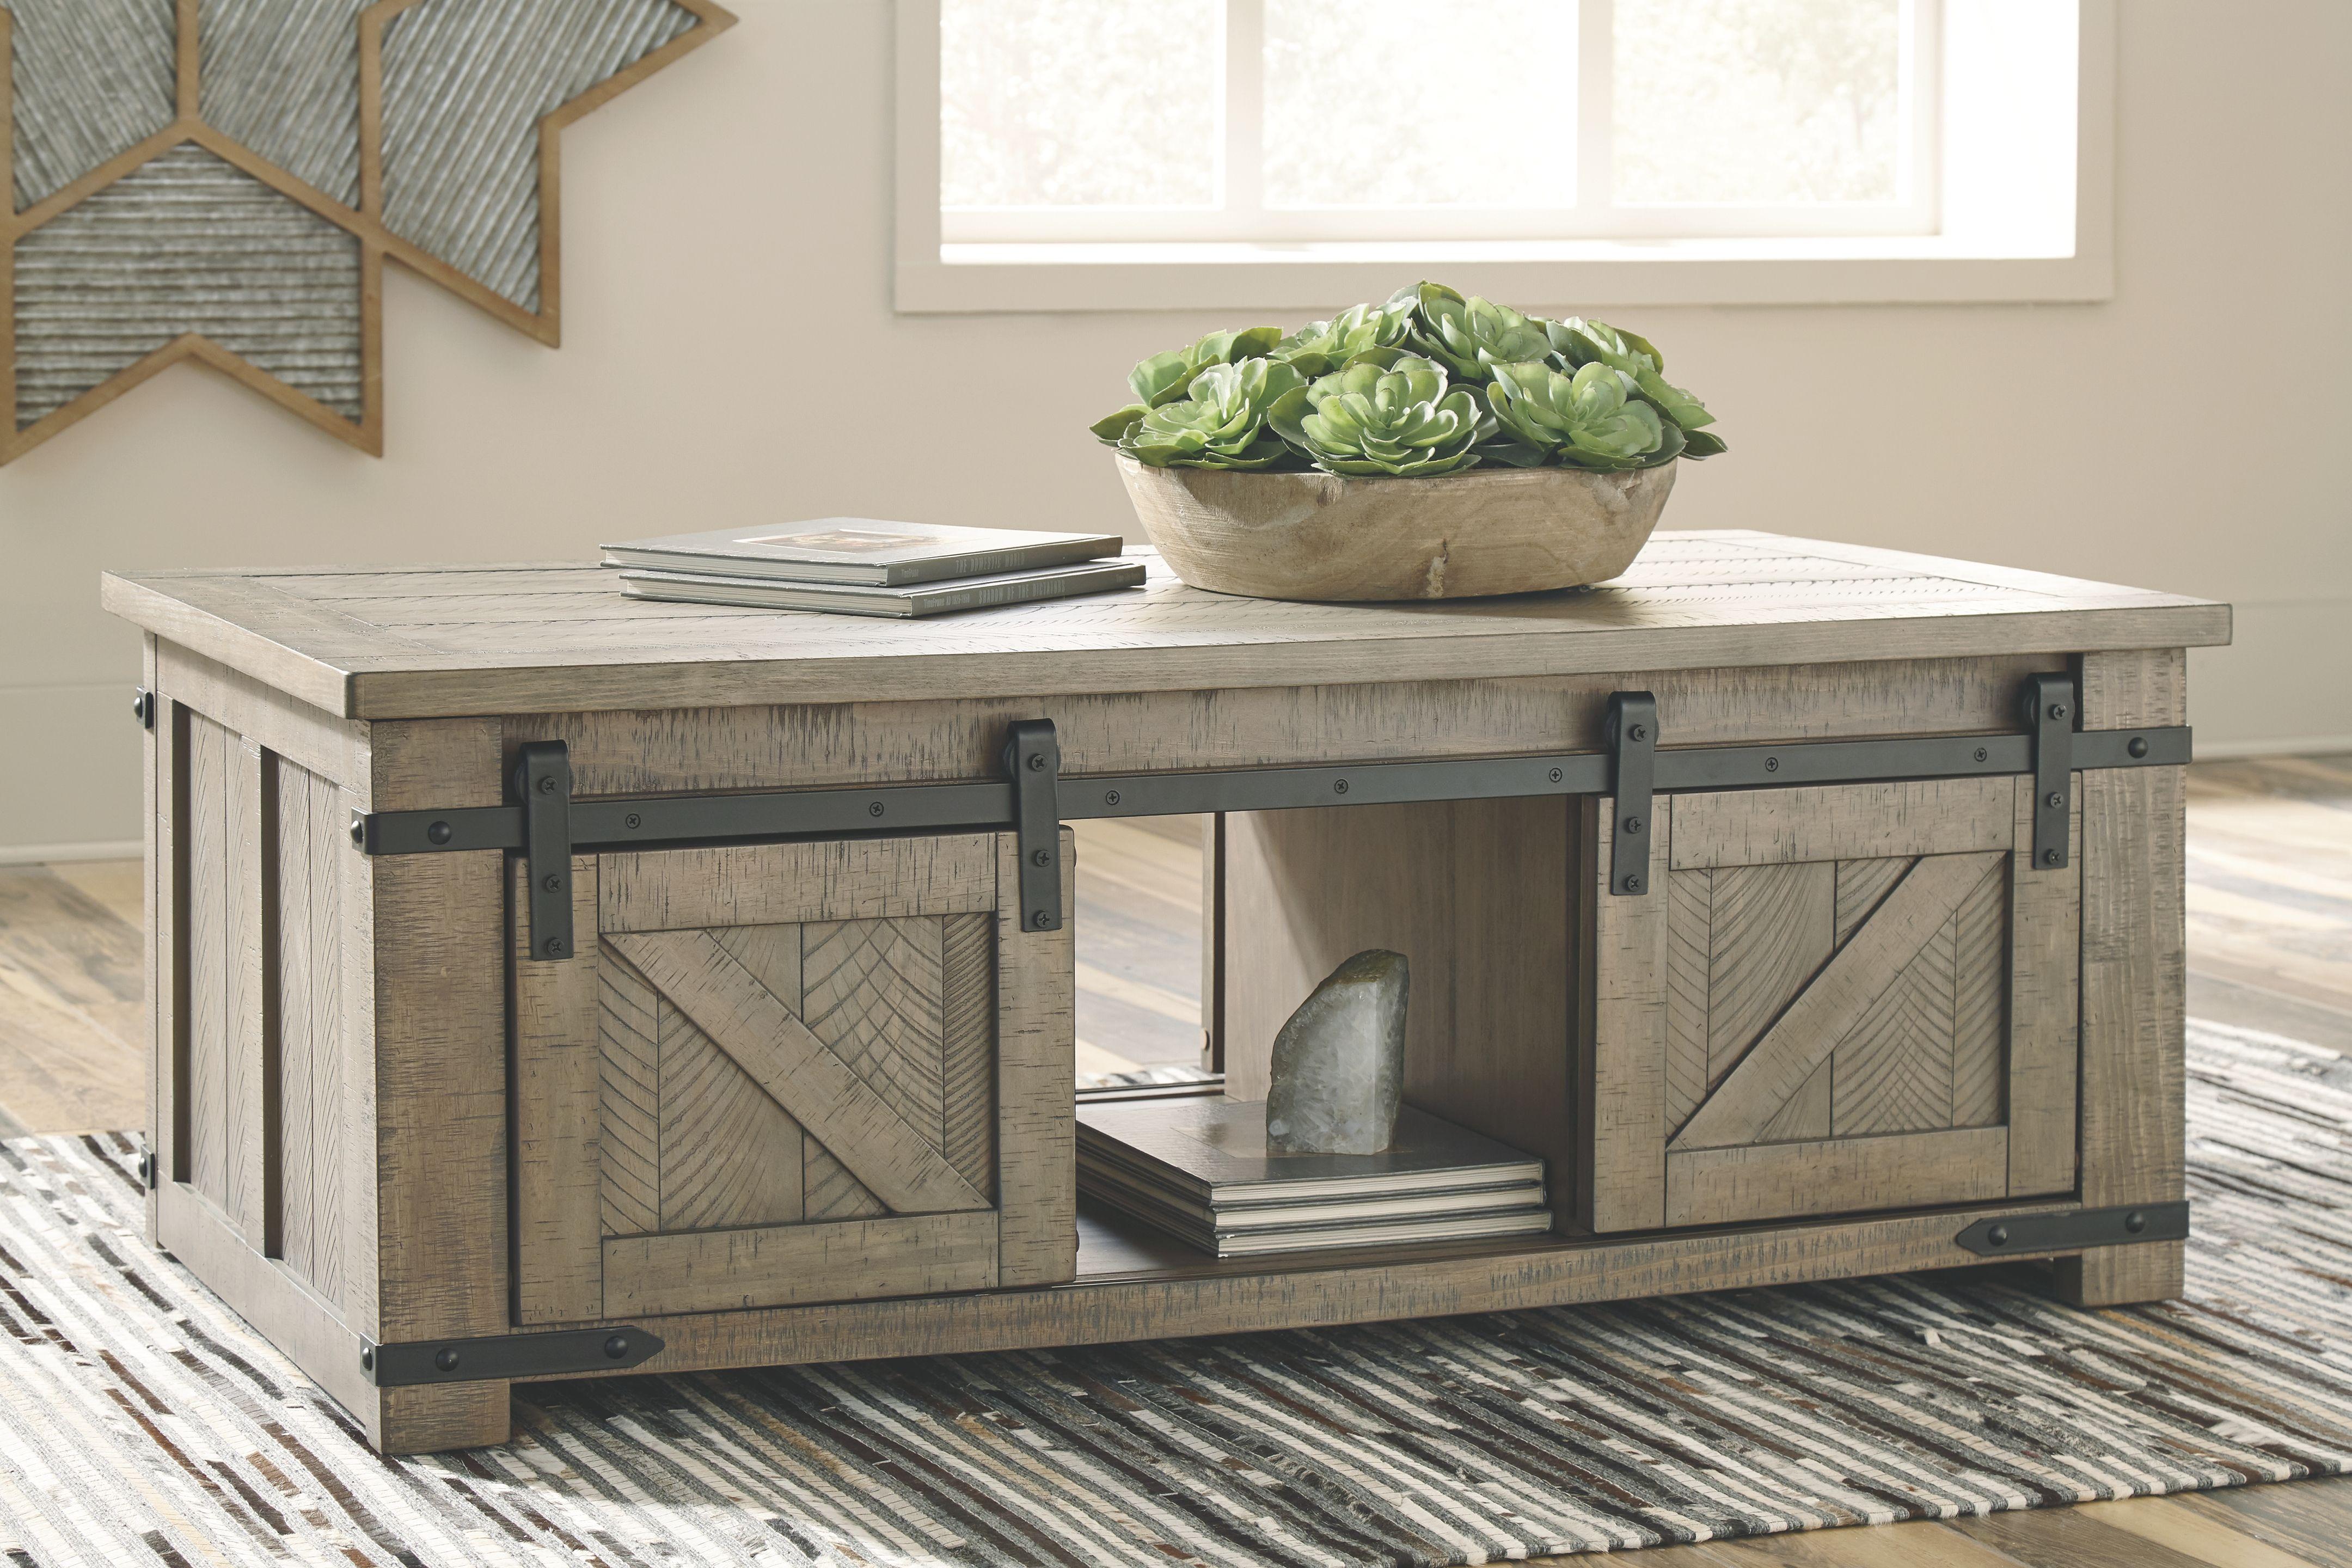 Aldwin Coffee Table Door Coffee Tables Rustic Farmhouse Furniture